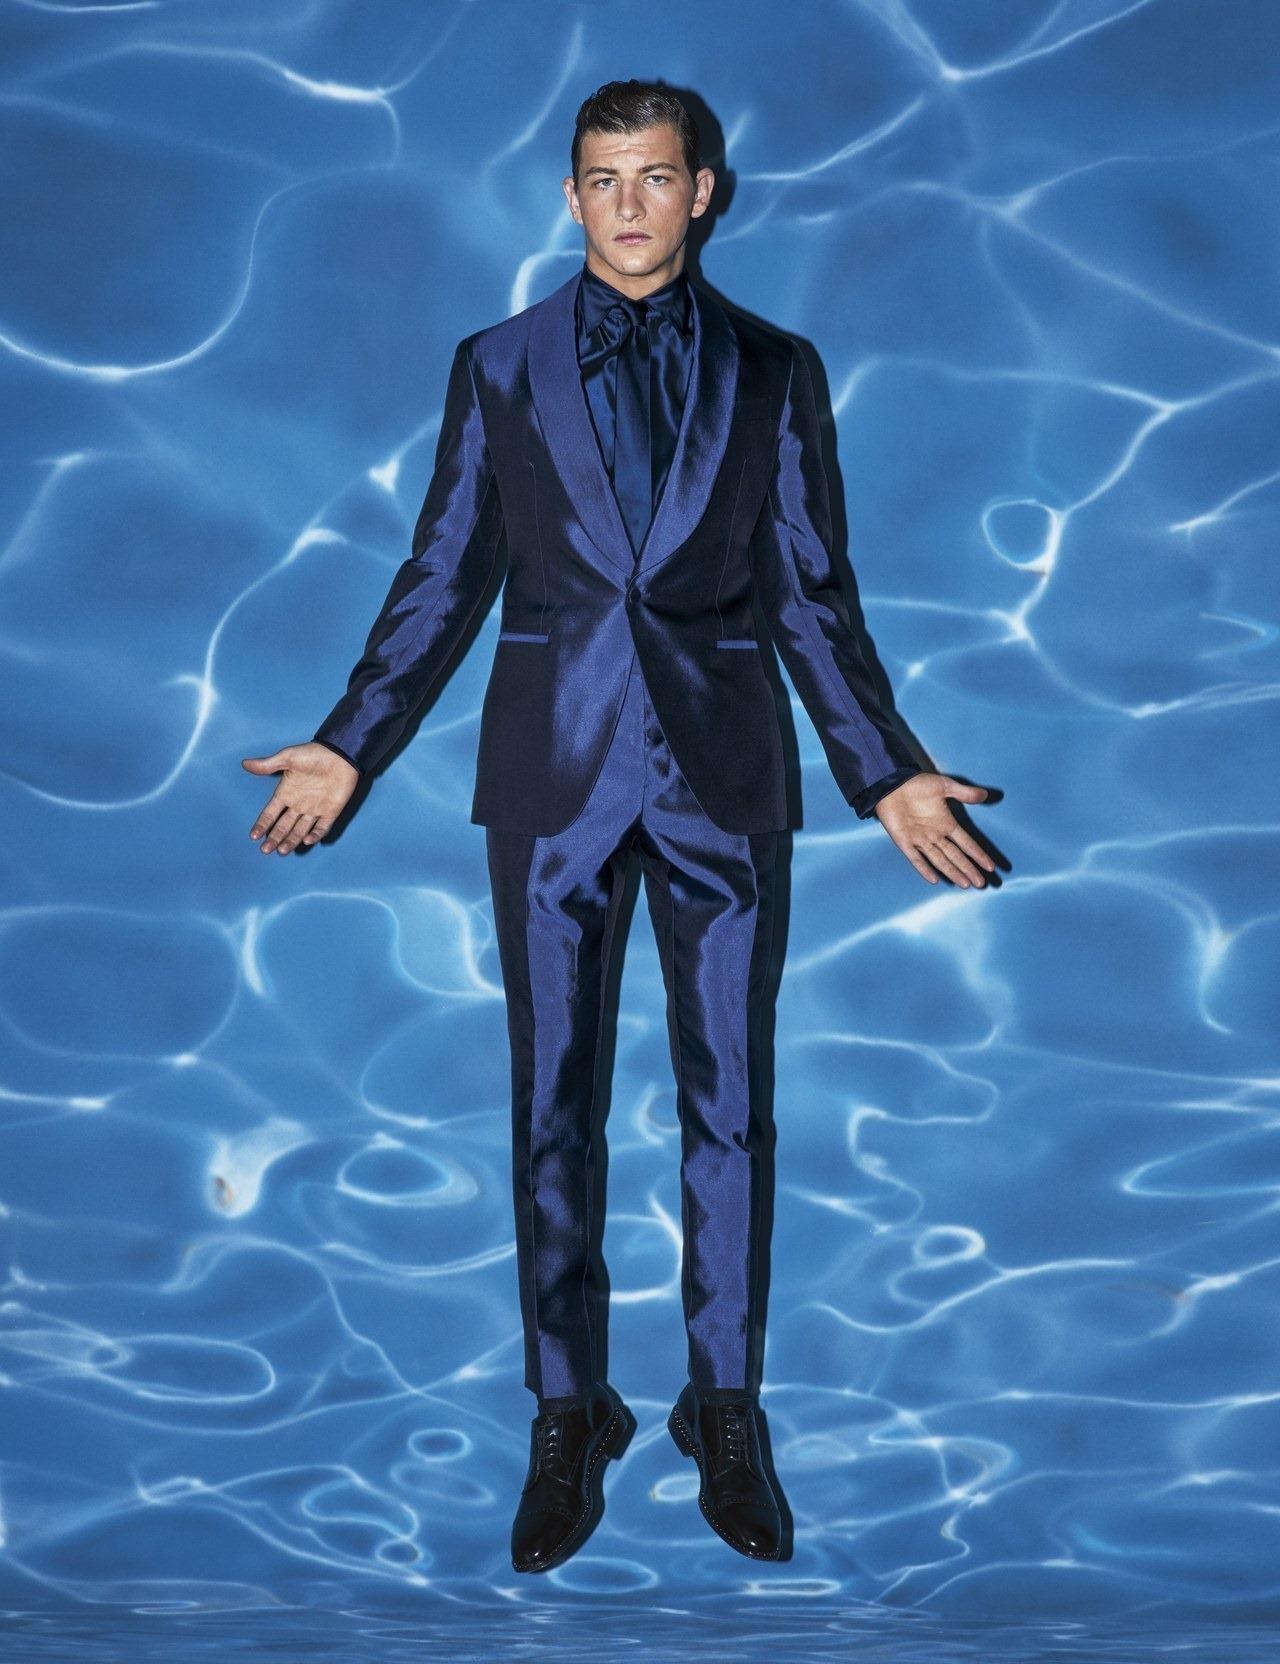 W MAGAZINE: Tye Sheridan by Ethan James Green - Image